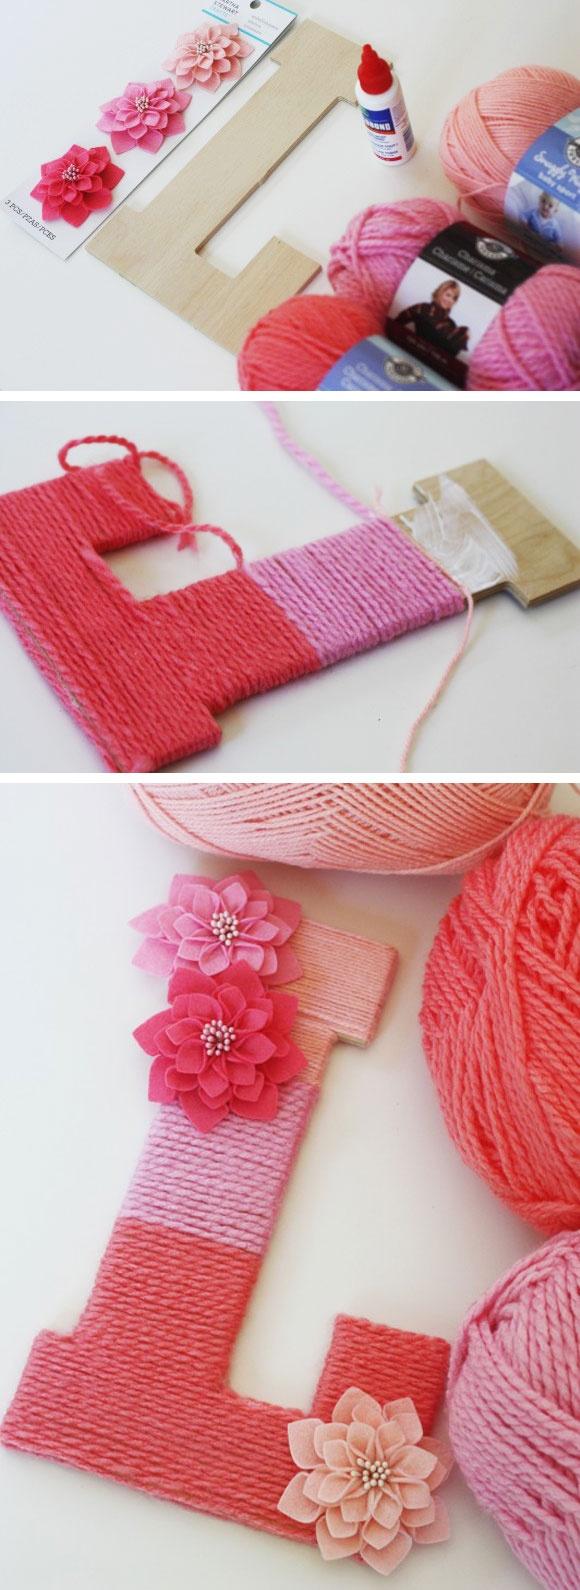 craft ideas for girls 1